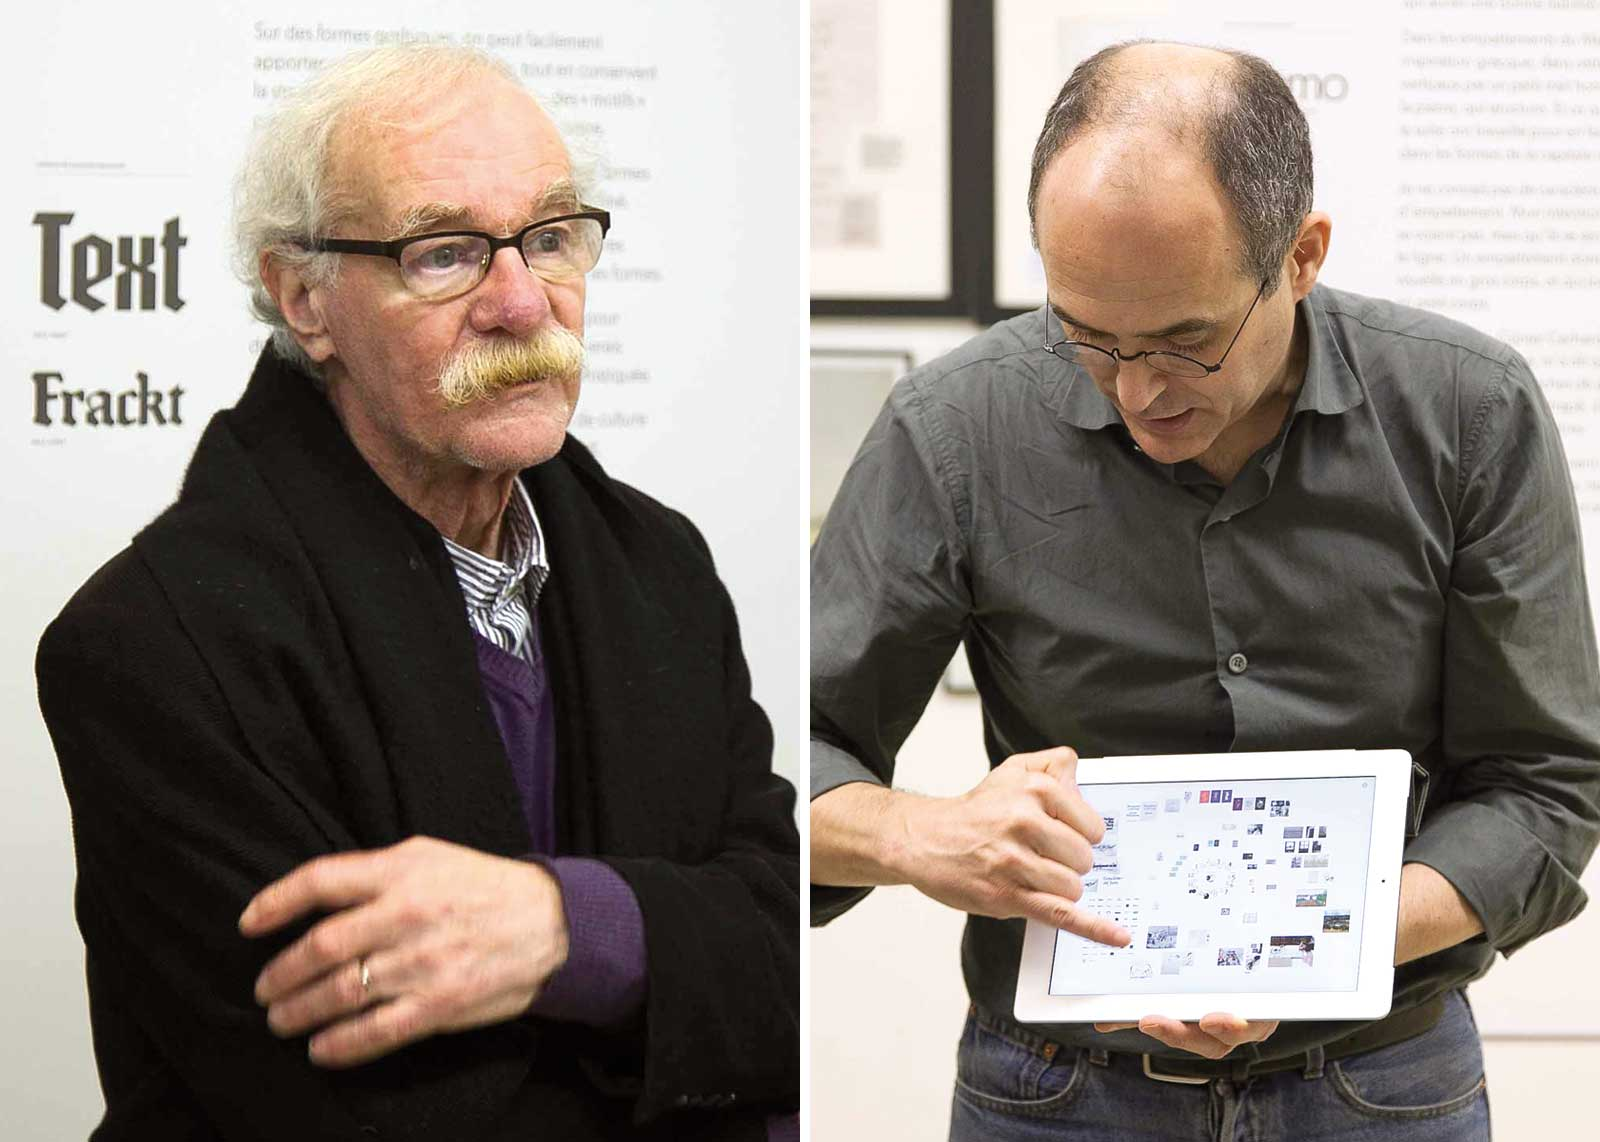 Albert Boton, visite guidée avec les Rencontres de Lure. Albert Boton, Olivier Nineuil (photo Denis Patouillard).